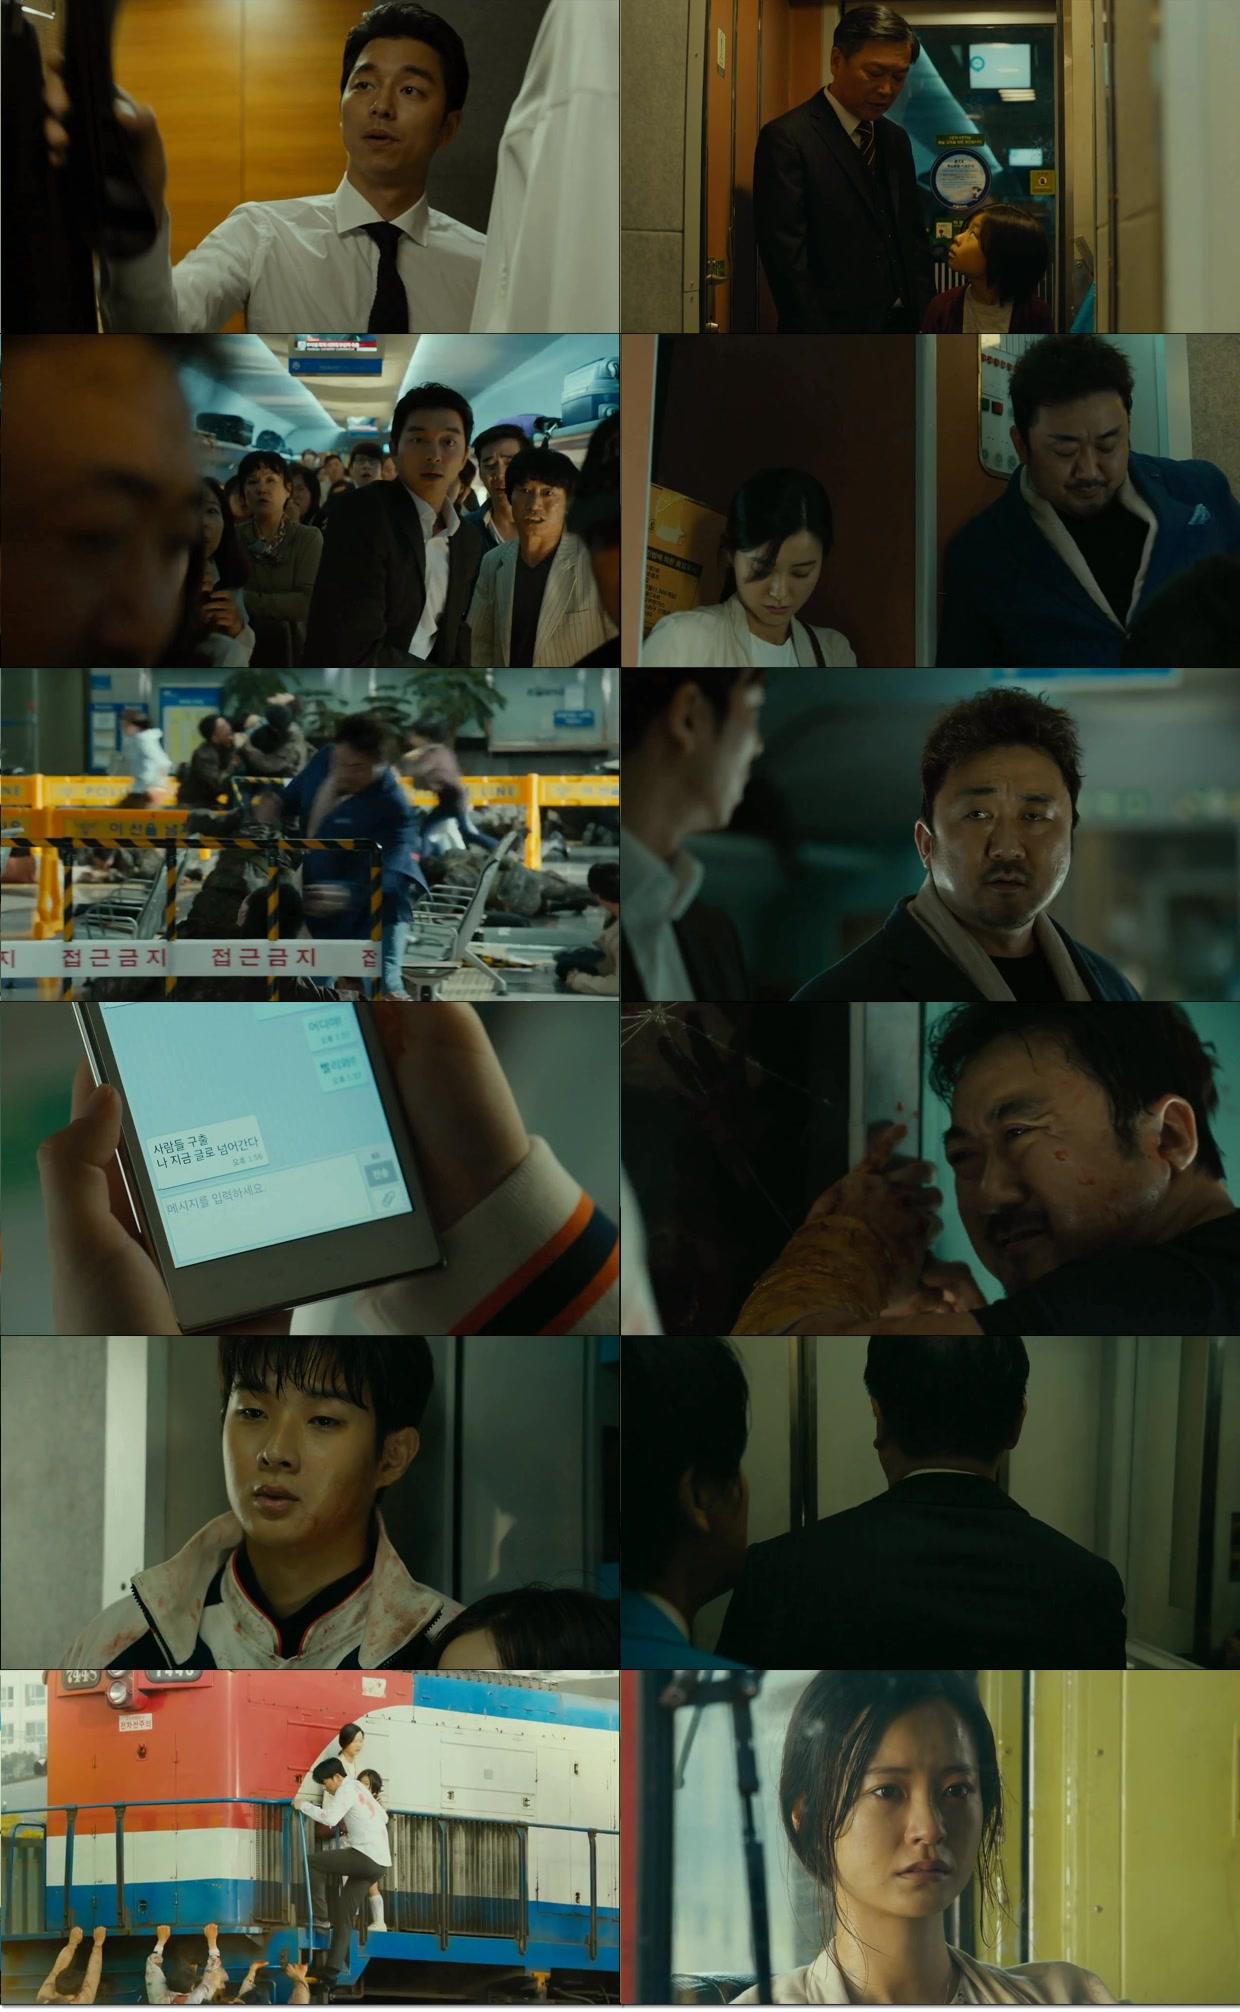 Train.To.Busan.2016.720p.HDRip.x264.AC3-FEWAT